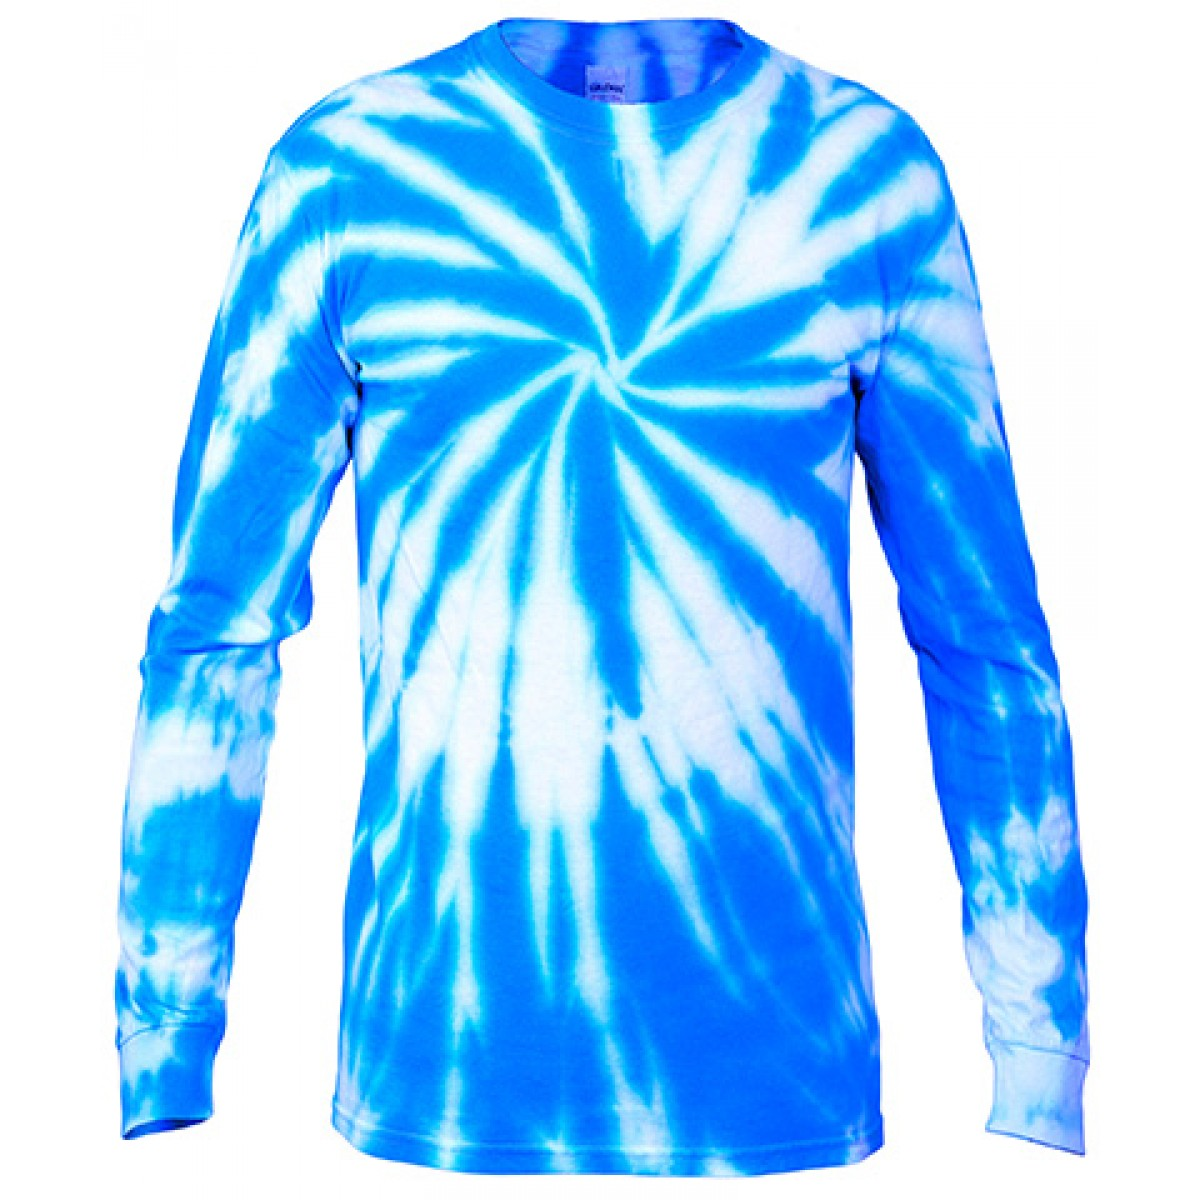 Multi Color Tie-Dye Long Sleeve Shirt -Blue-M